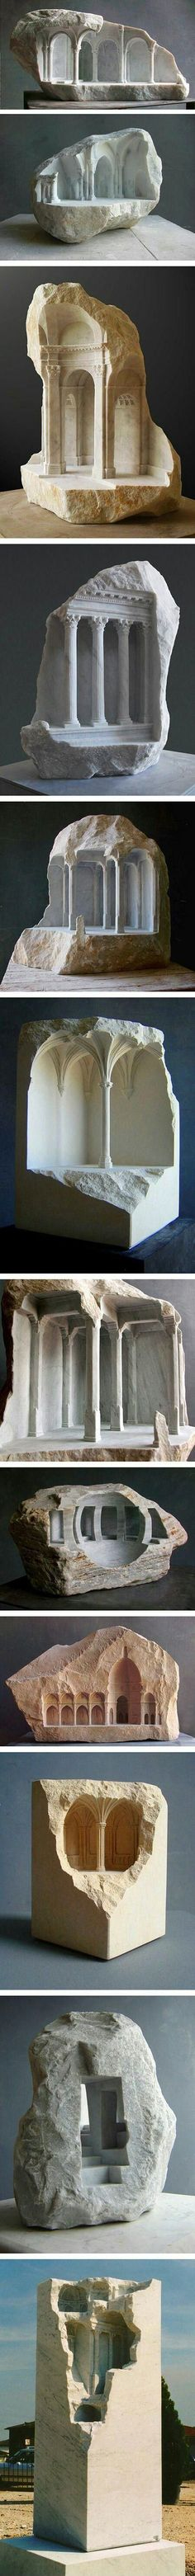 Amazing+sculptures+by+Matthew+Simmonds